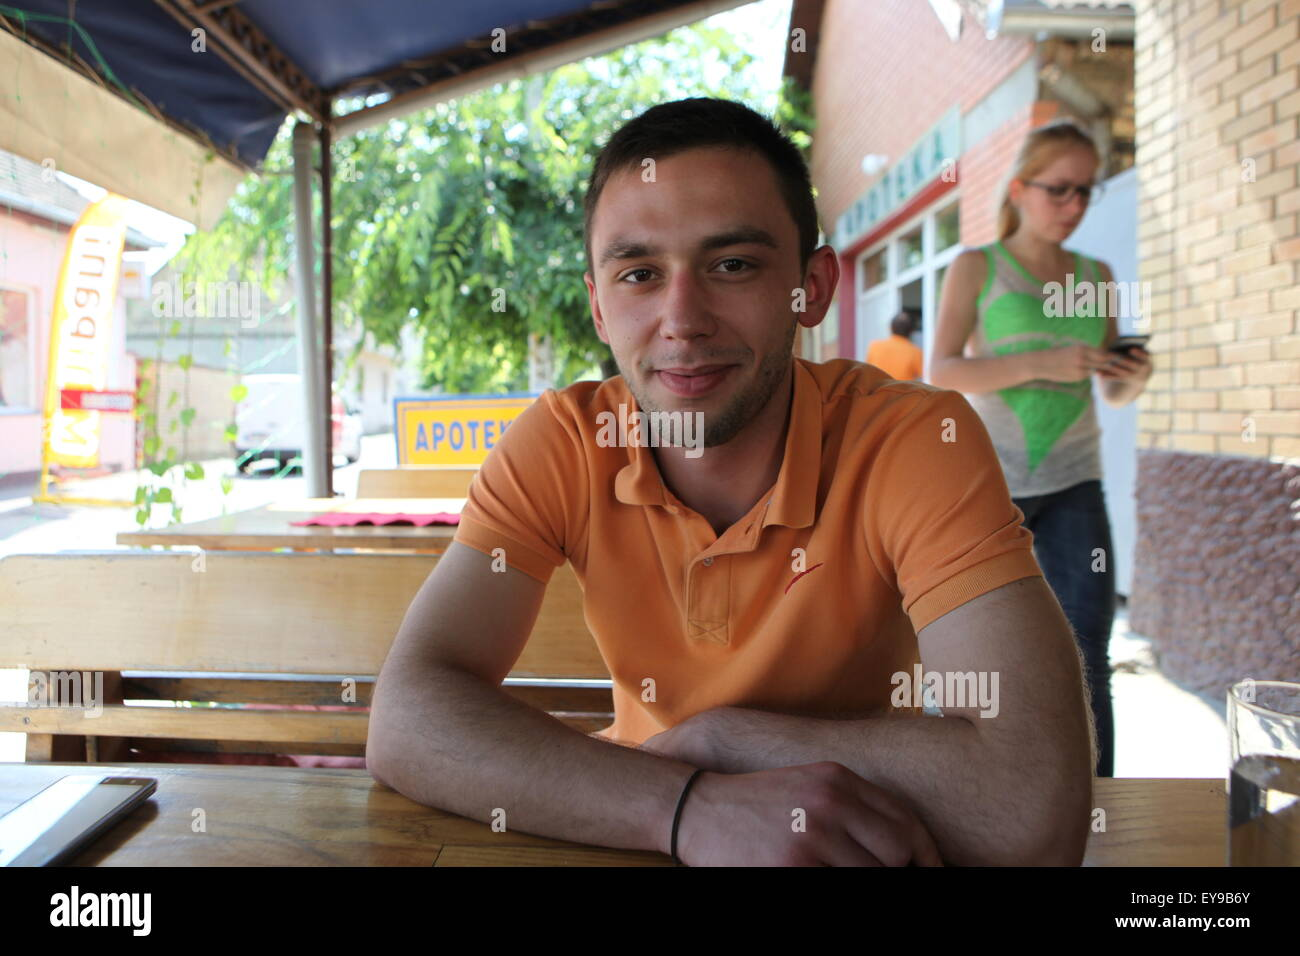 Neven, young Serb from Bezdan /  Neven, jeune Serbe de Bezdan - Stock Image